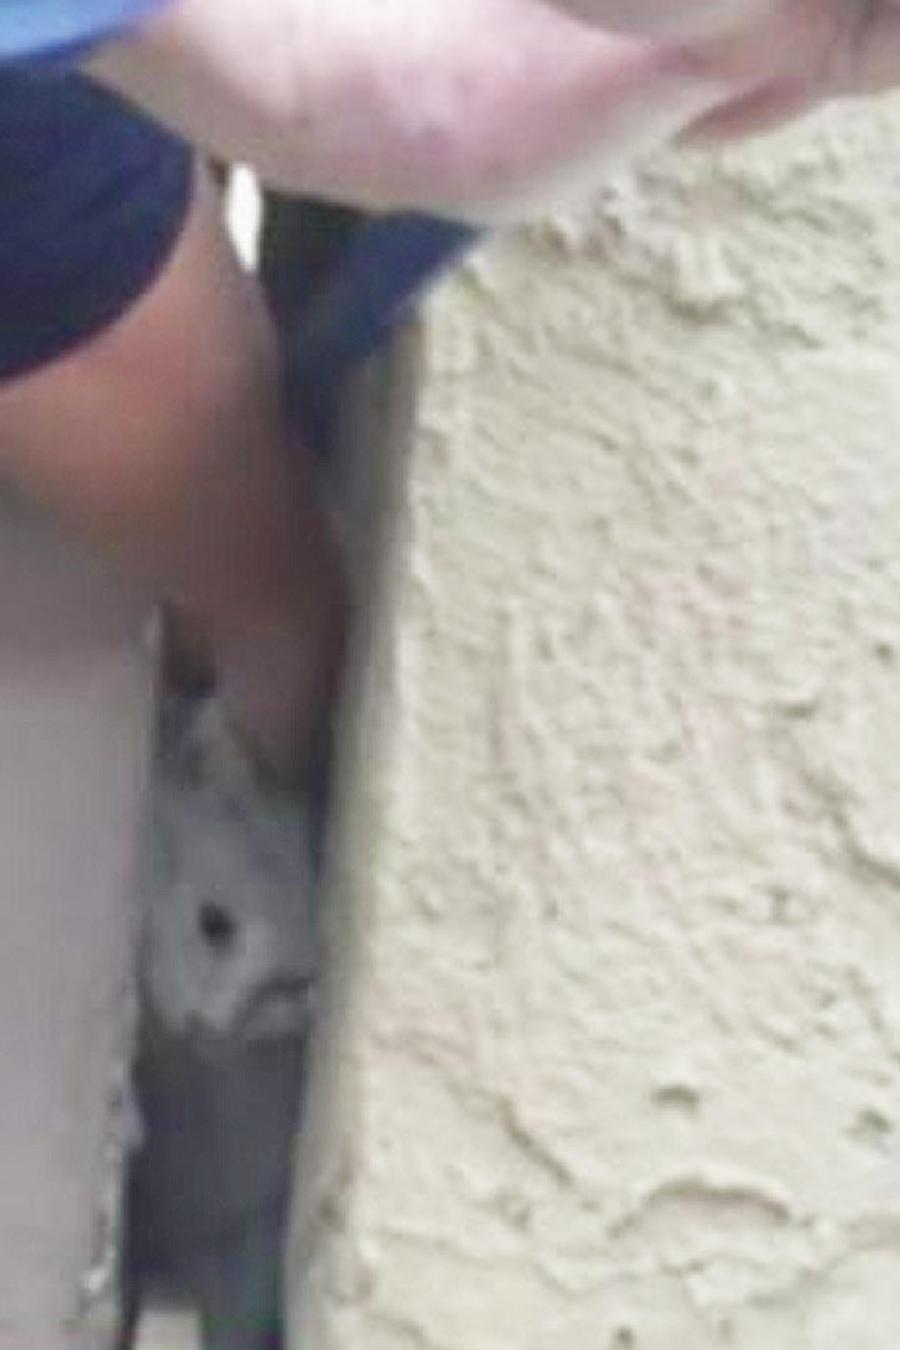 gato entre grietas de paredes